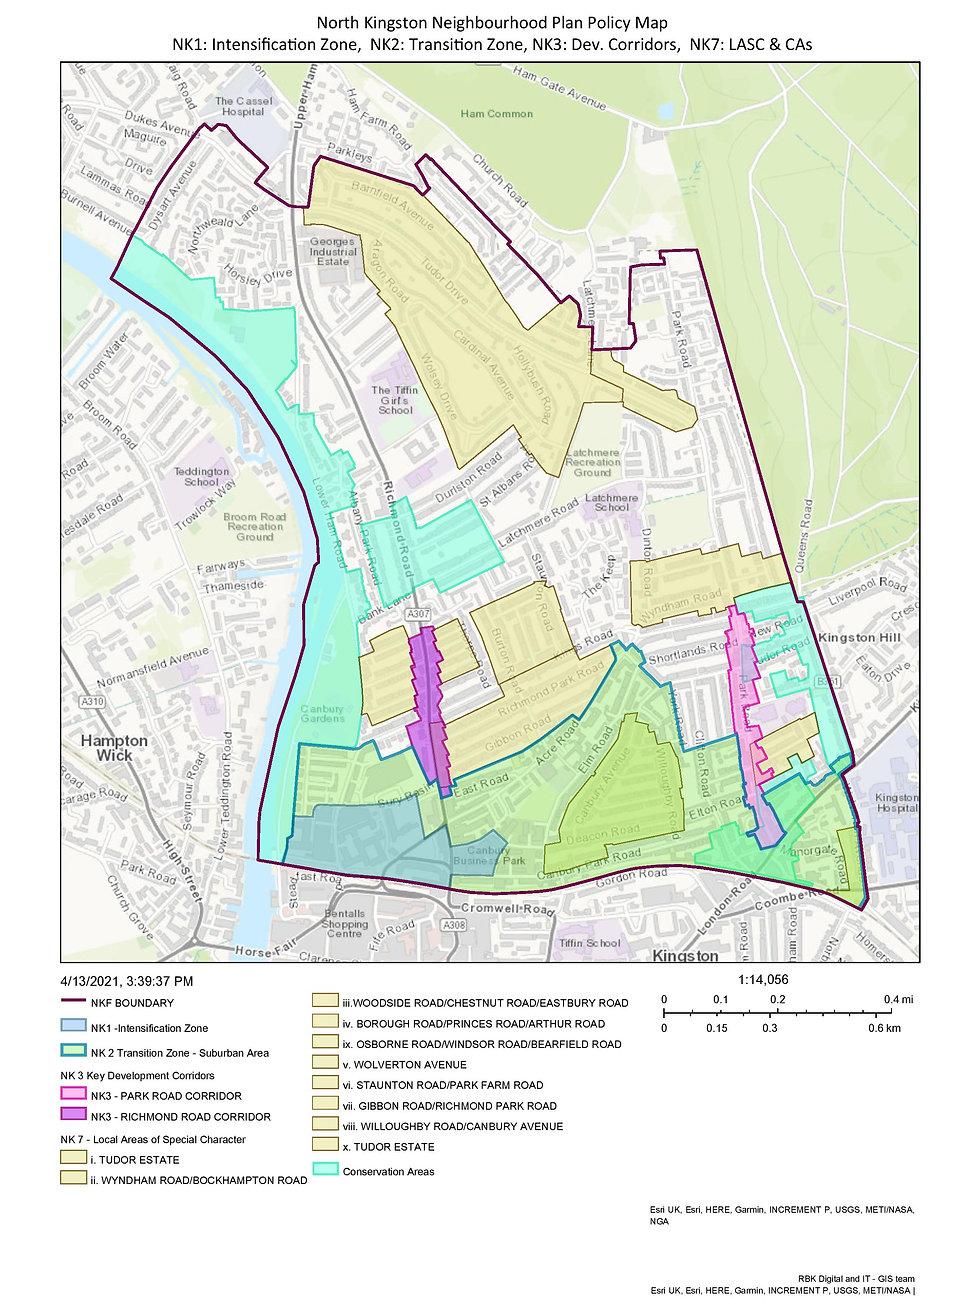 NKNPlan Policy Map NK1, NK2, NK3, NK7 an